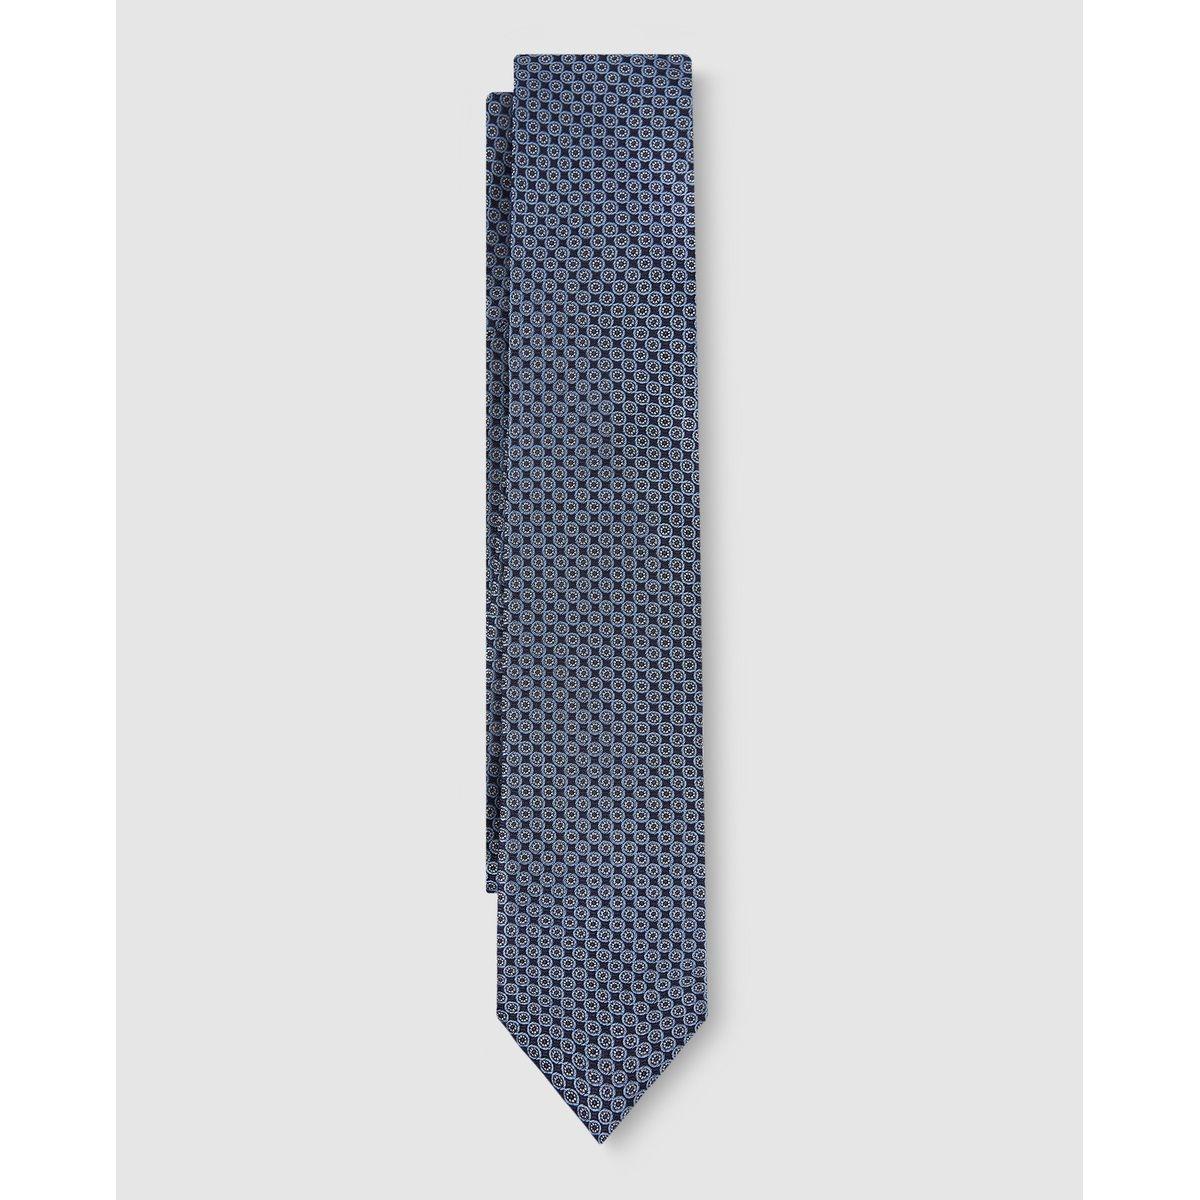 Cravate en soie naturelle imprimé fantaisie